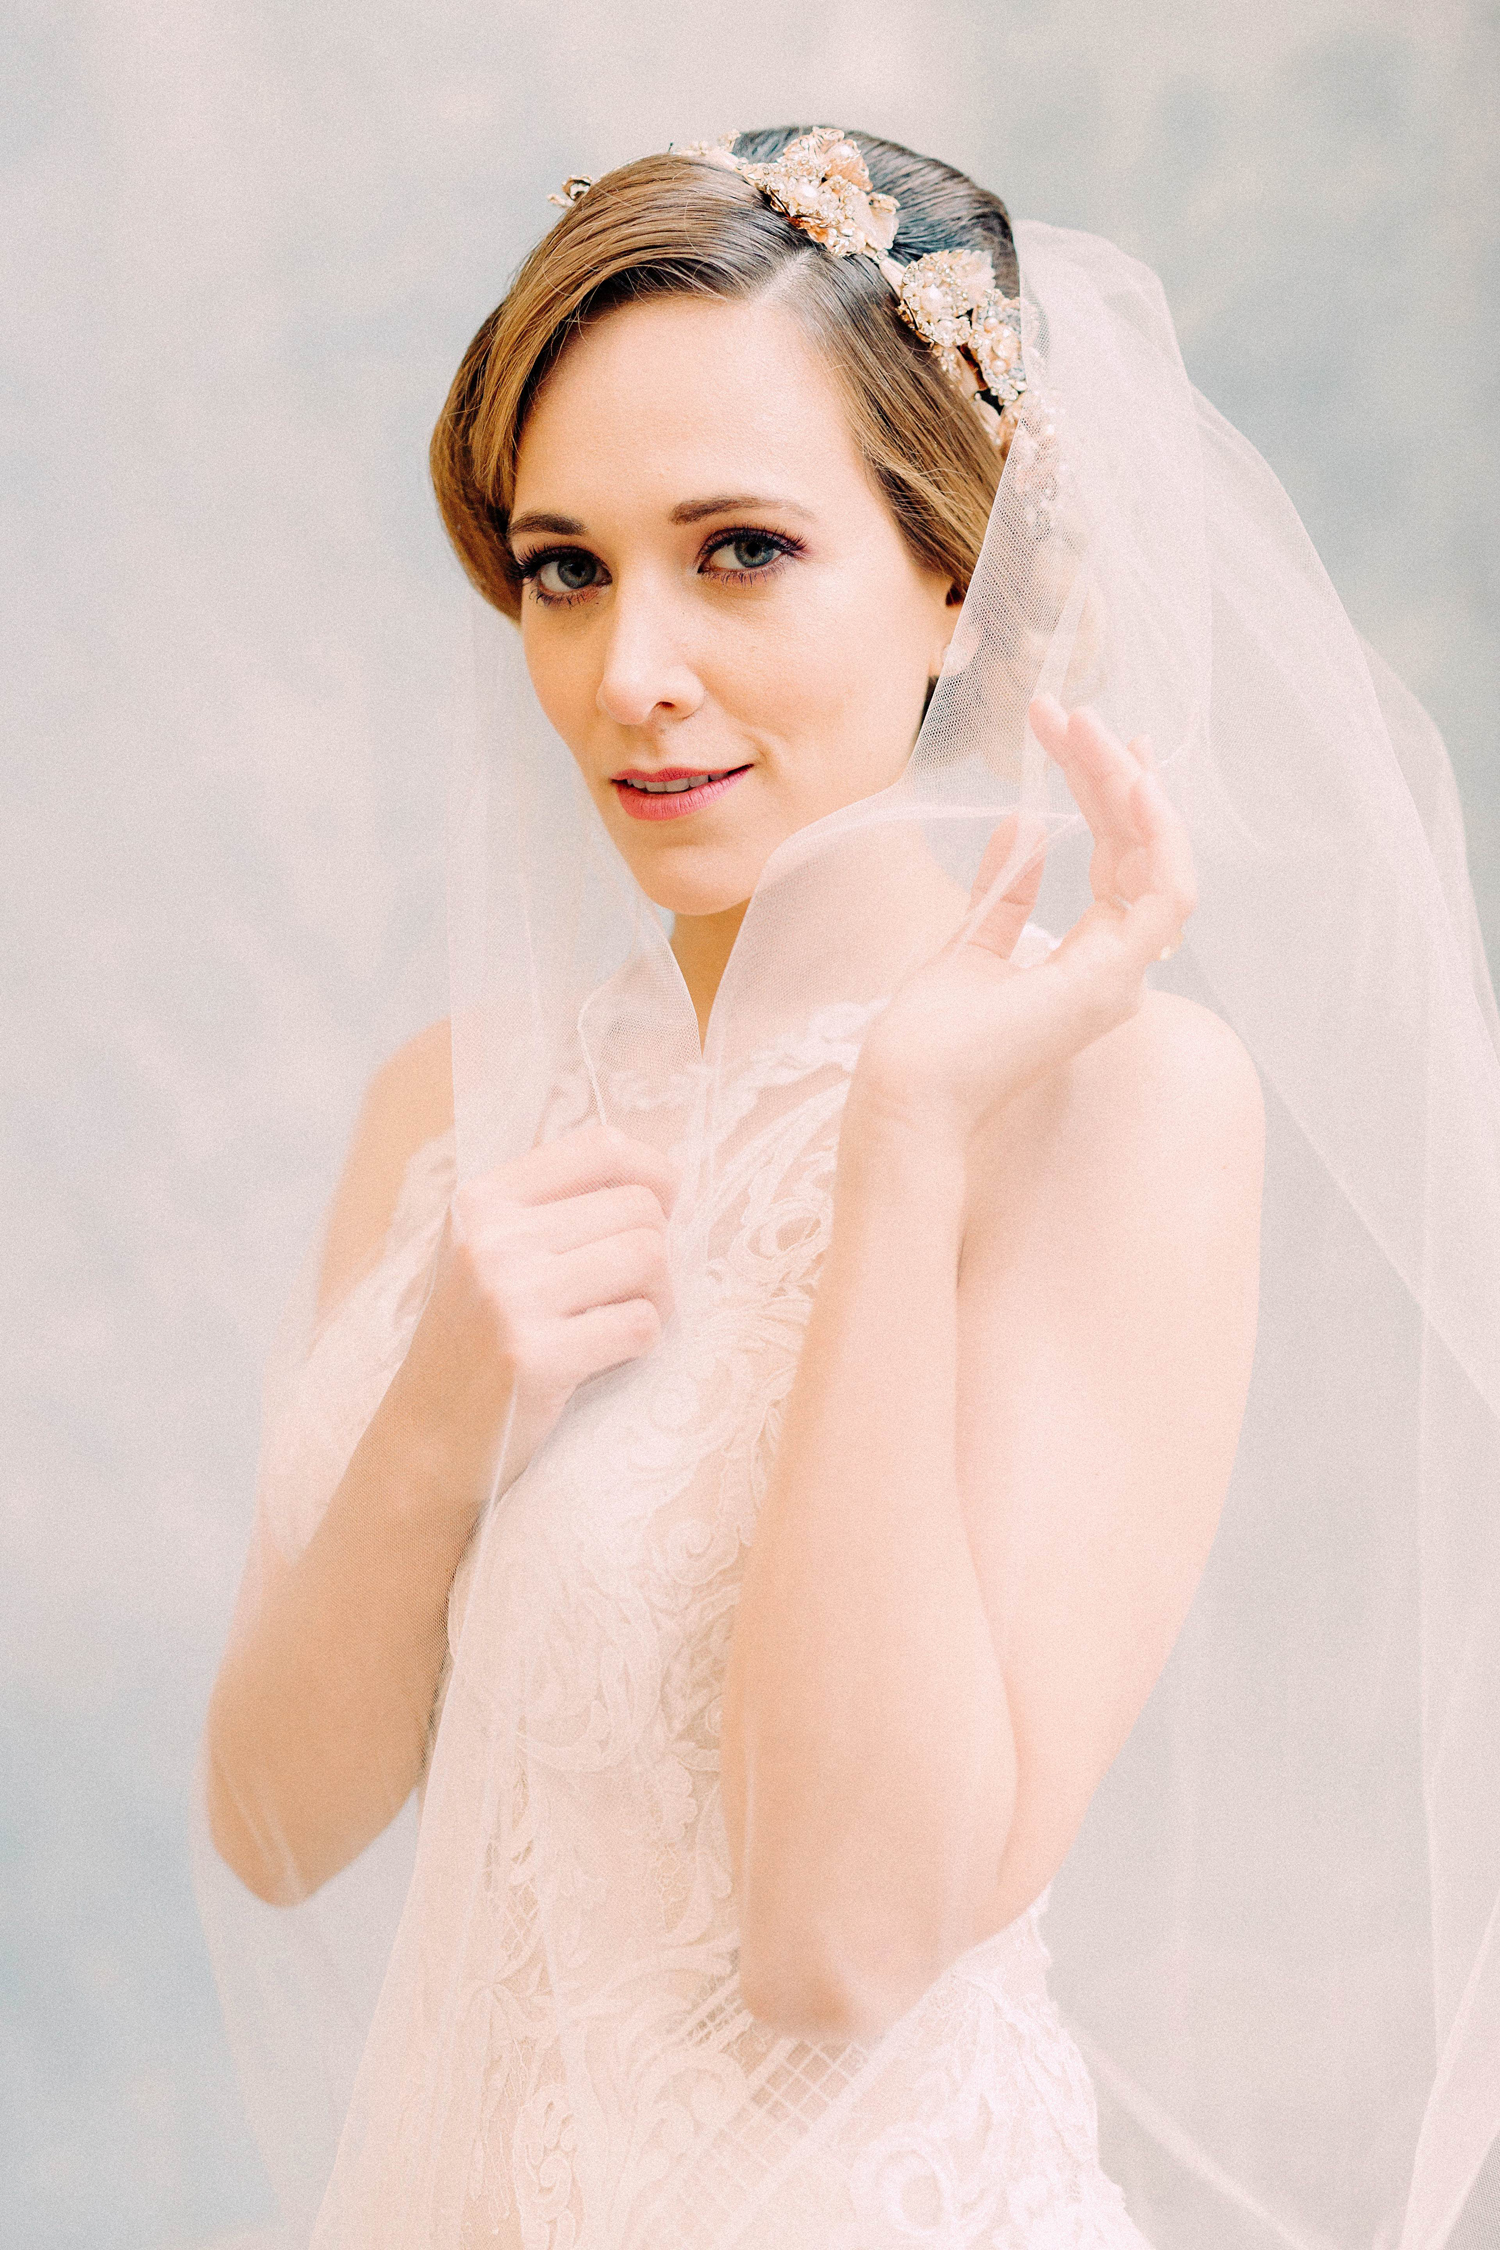 022-alaamarzouk-alaamarzoukphotography-mcallenweddingphotographer-alaa-marzouk-mcallen-mission-wedding-texas-venue-photography-wedding-california-bride-bridal-engagement-austin-elopement.jpg